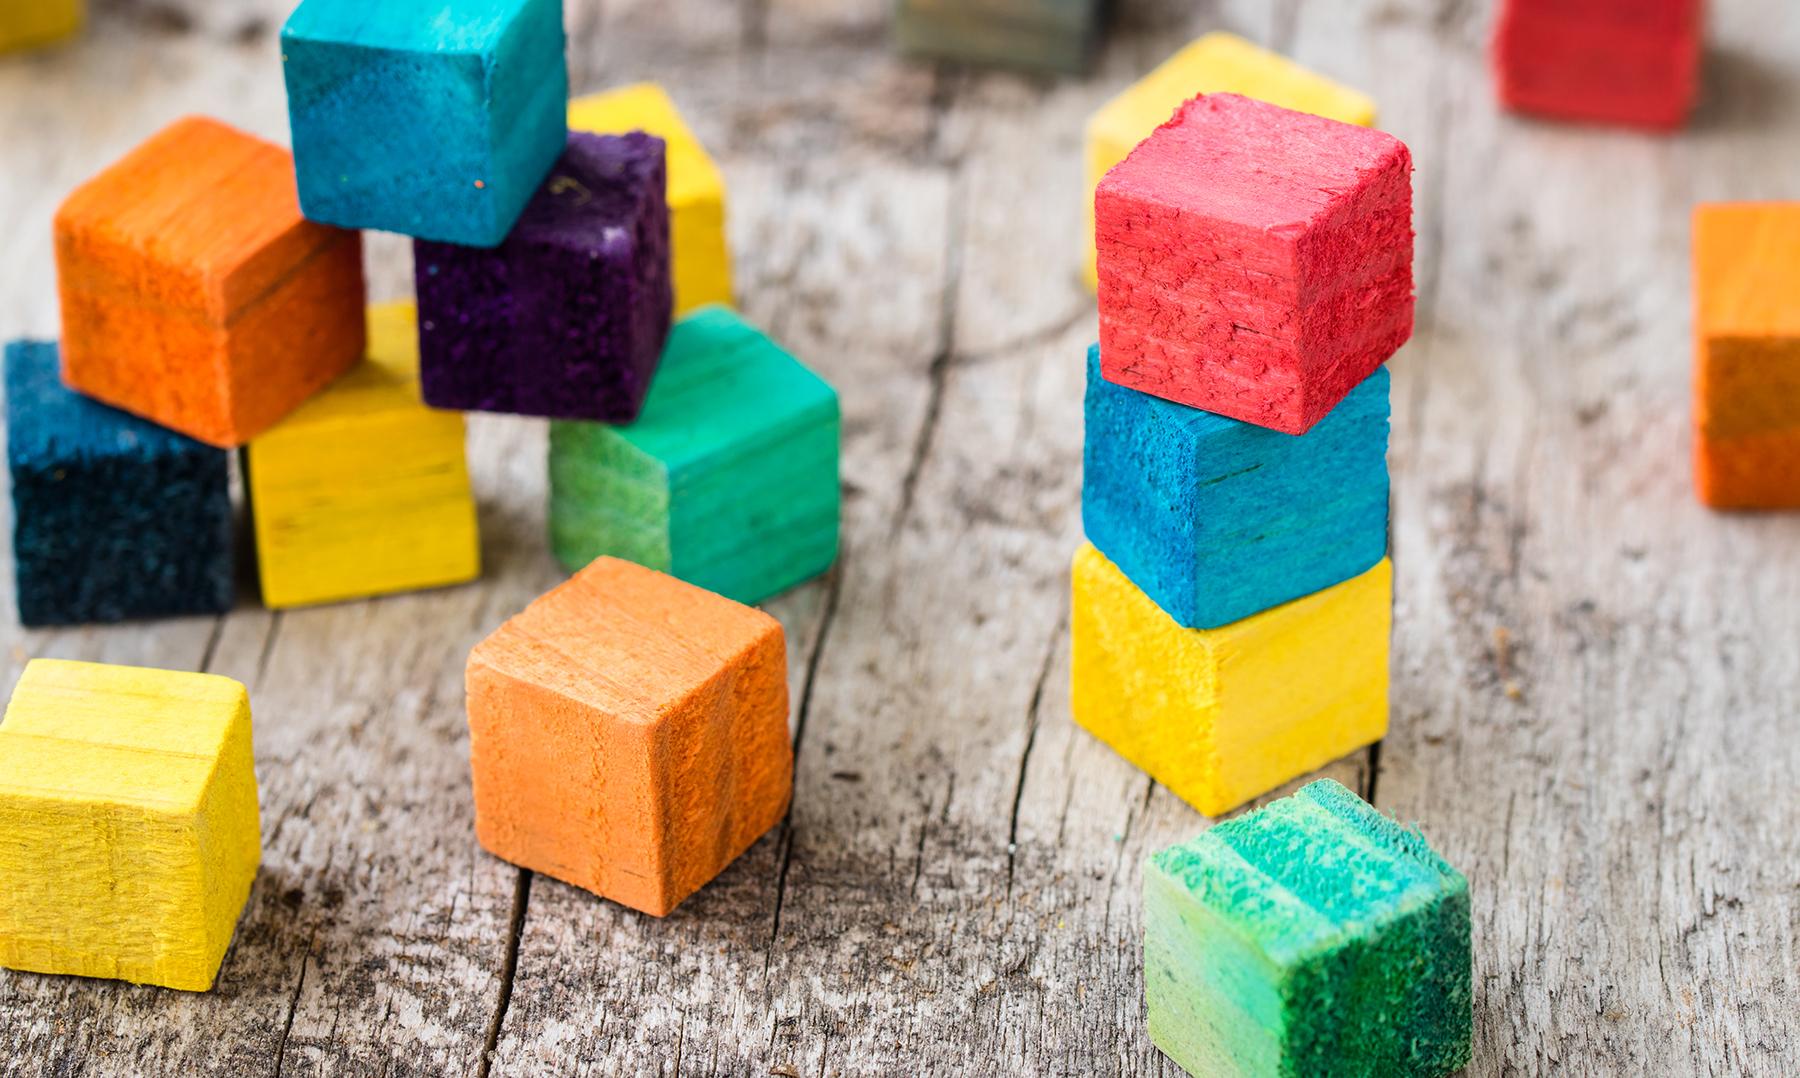 Colorful Wood blocks randomly stacked